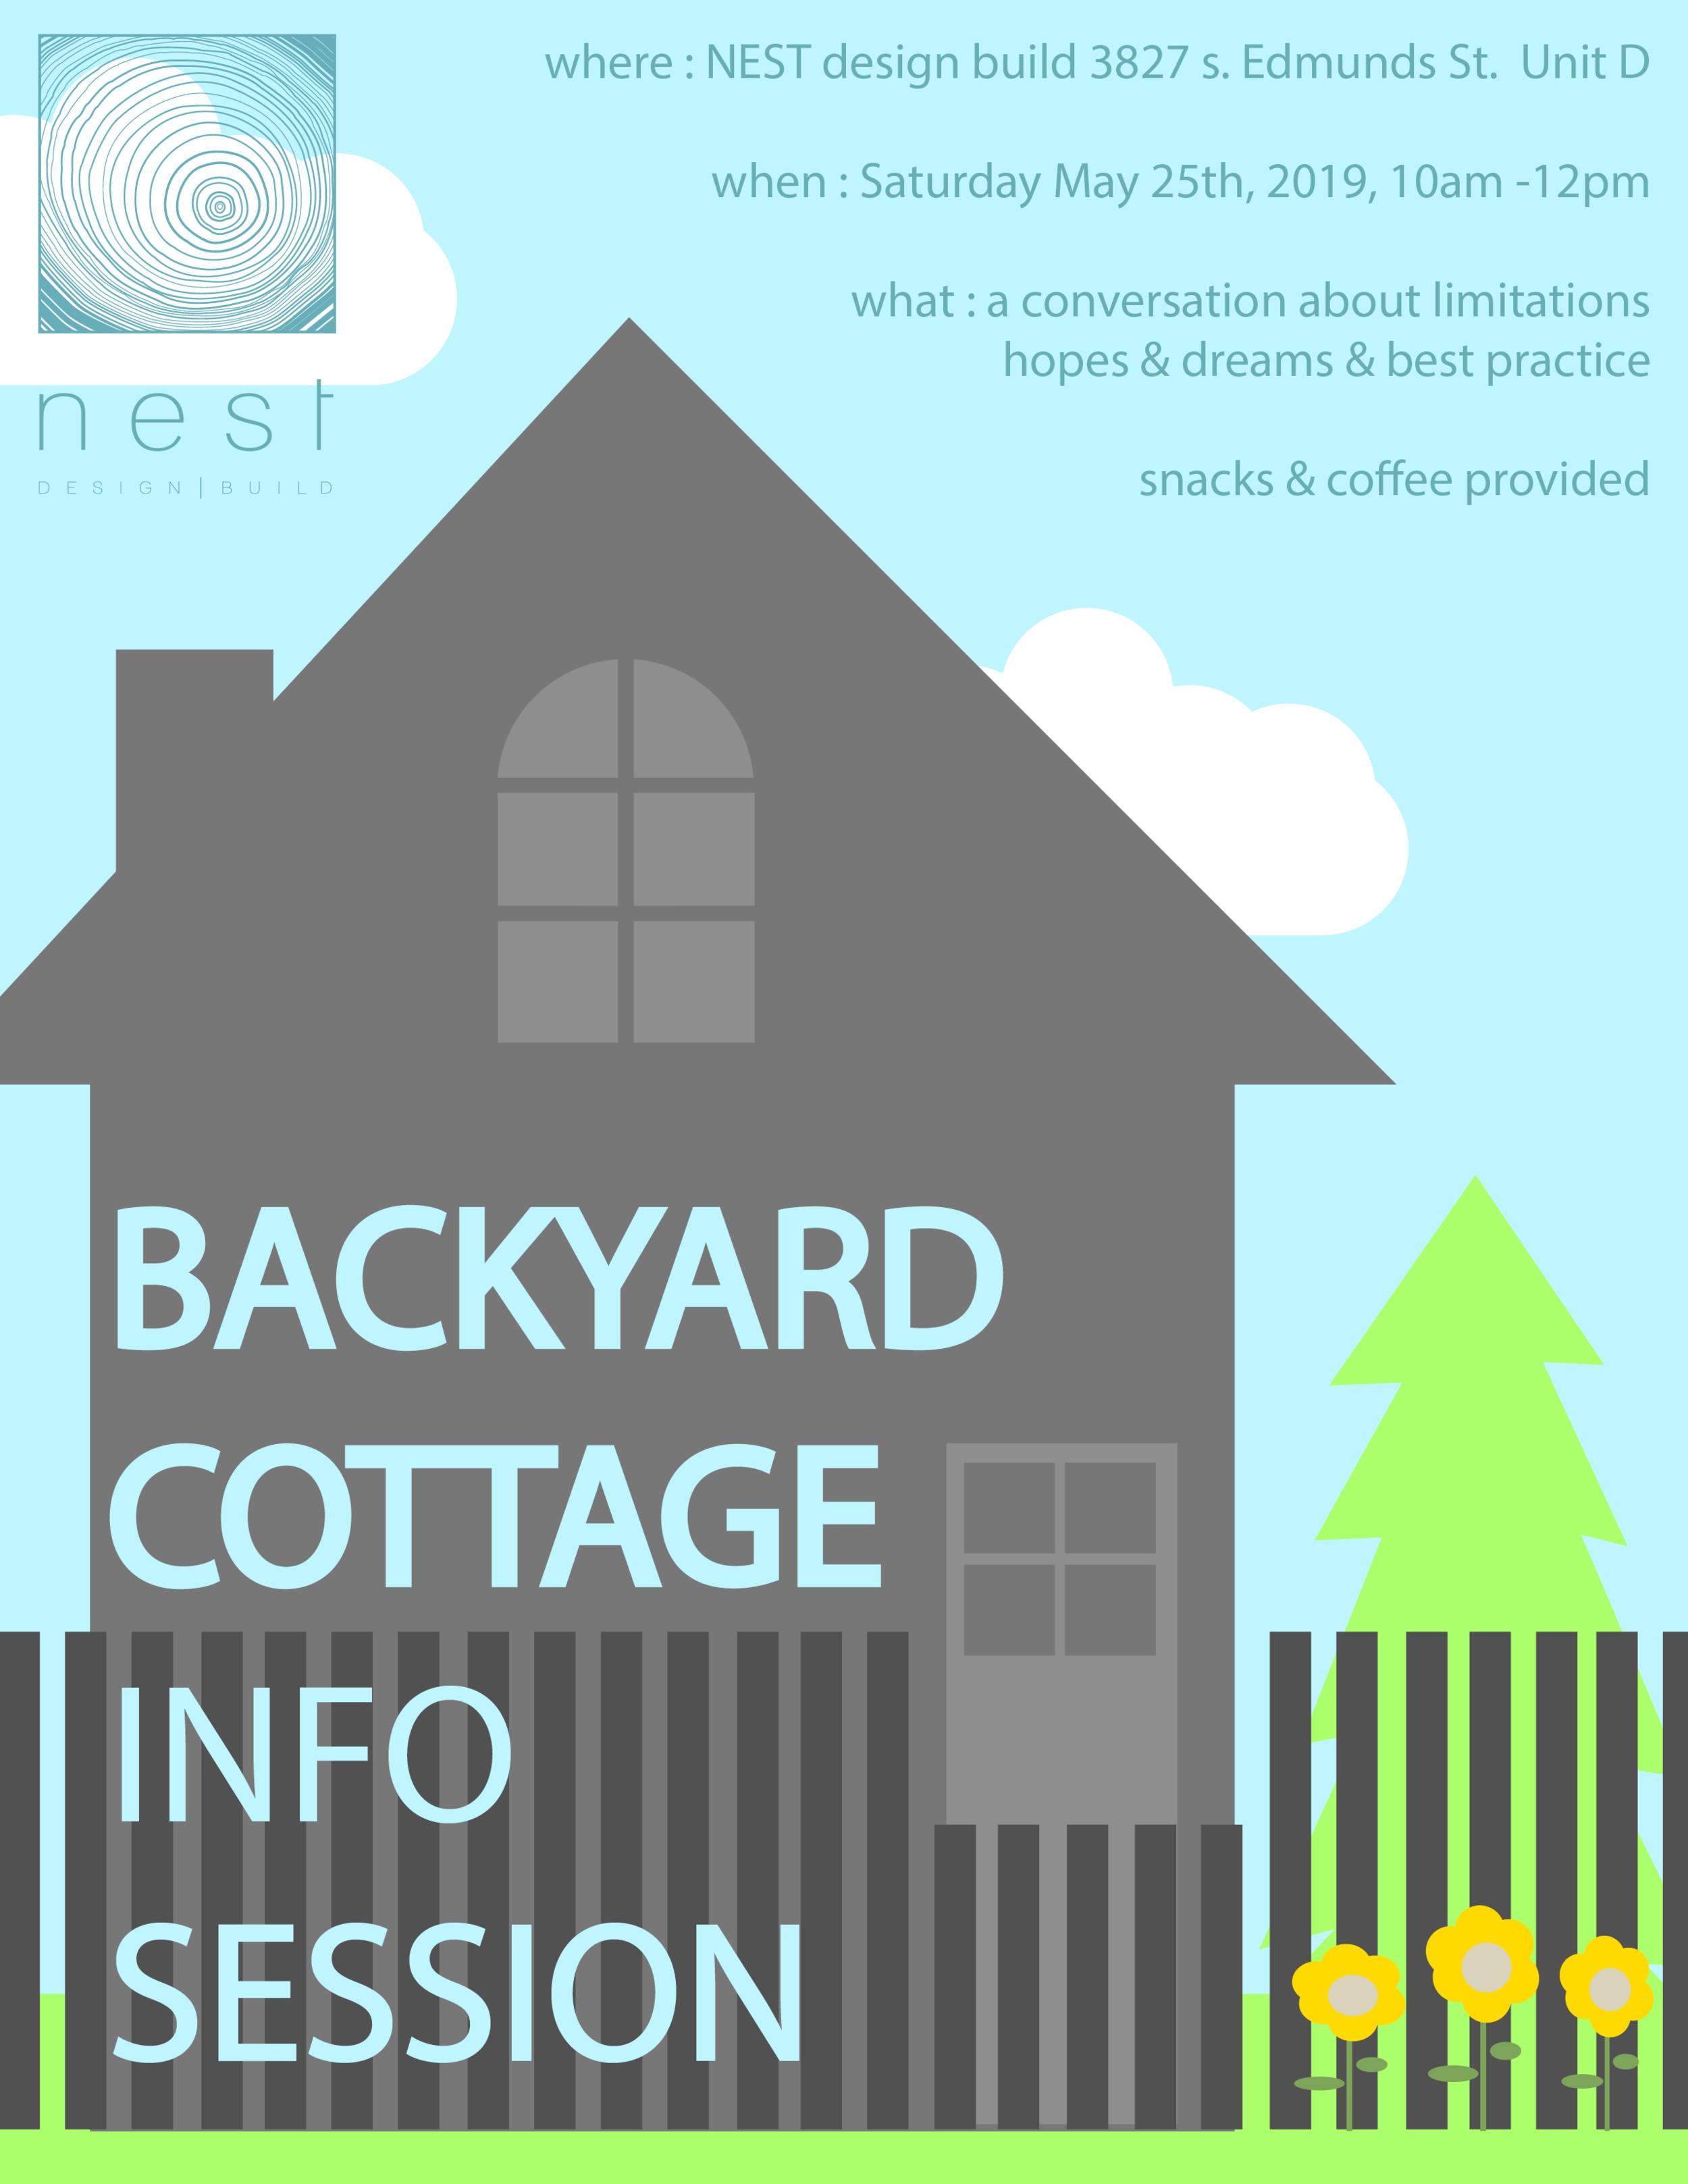 backyard cottage info session flyer-01.png